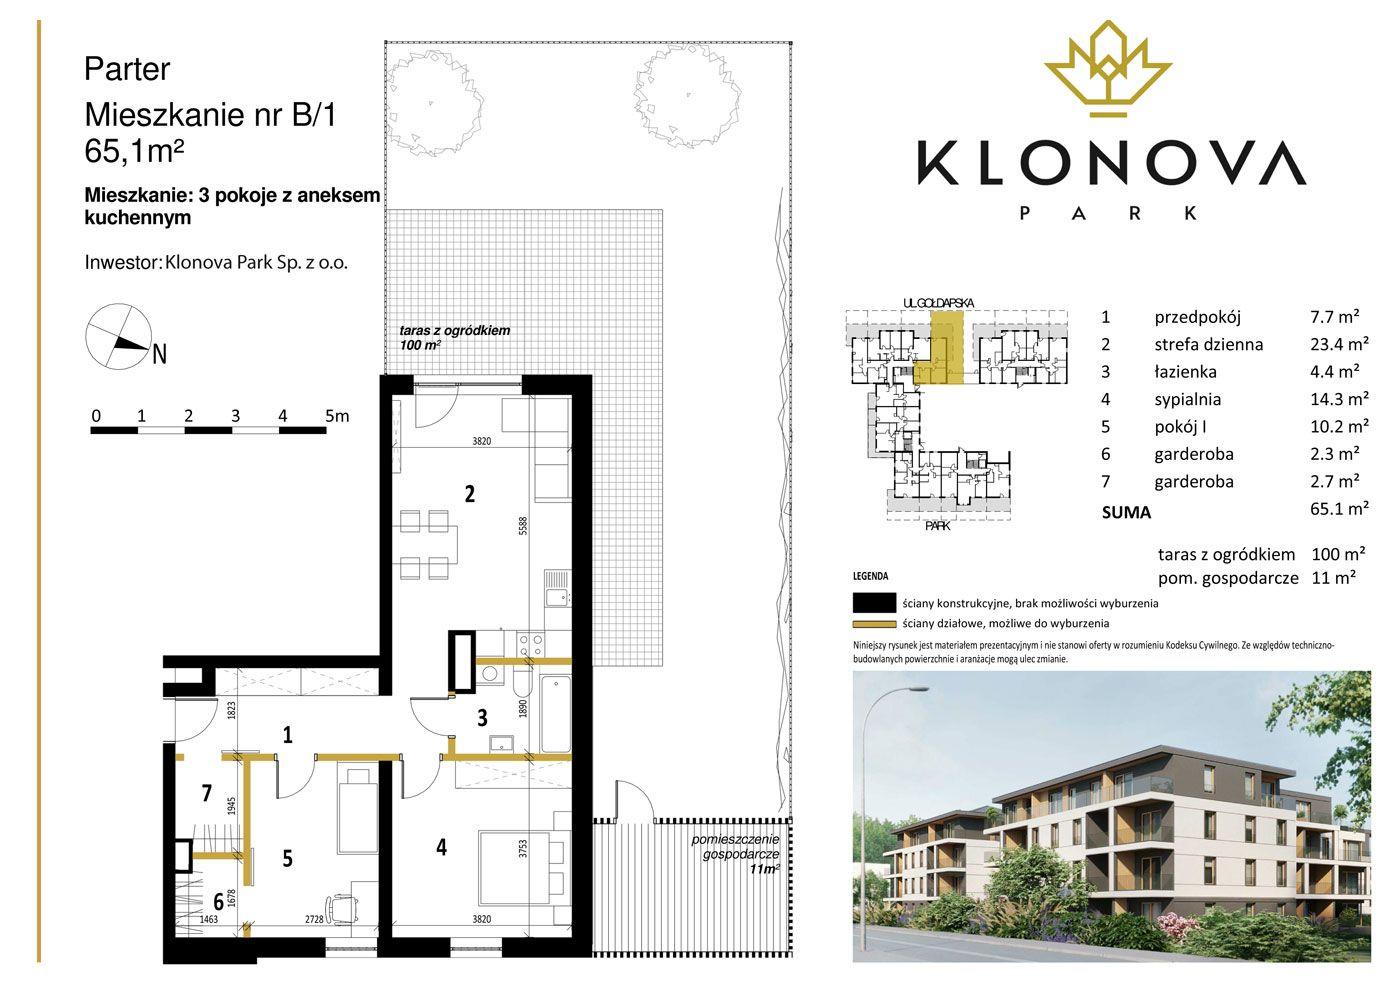 Apartamenty Klonova Park - Plan mieszkania B/1